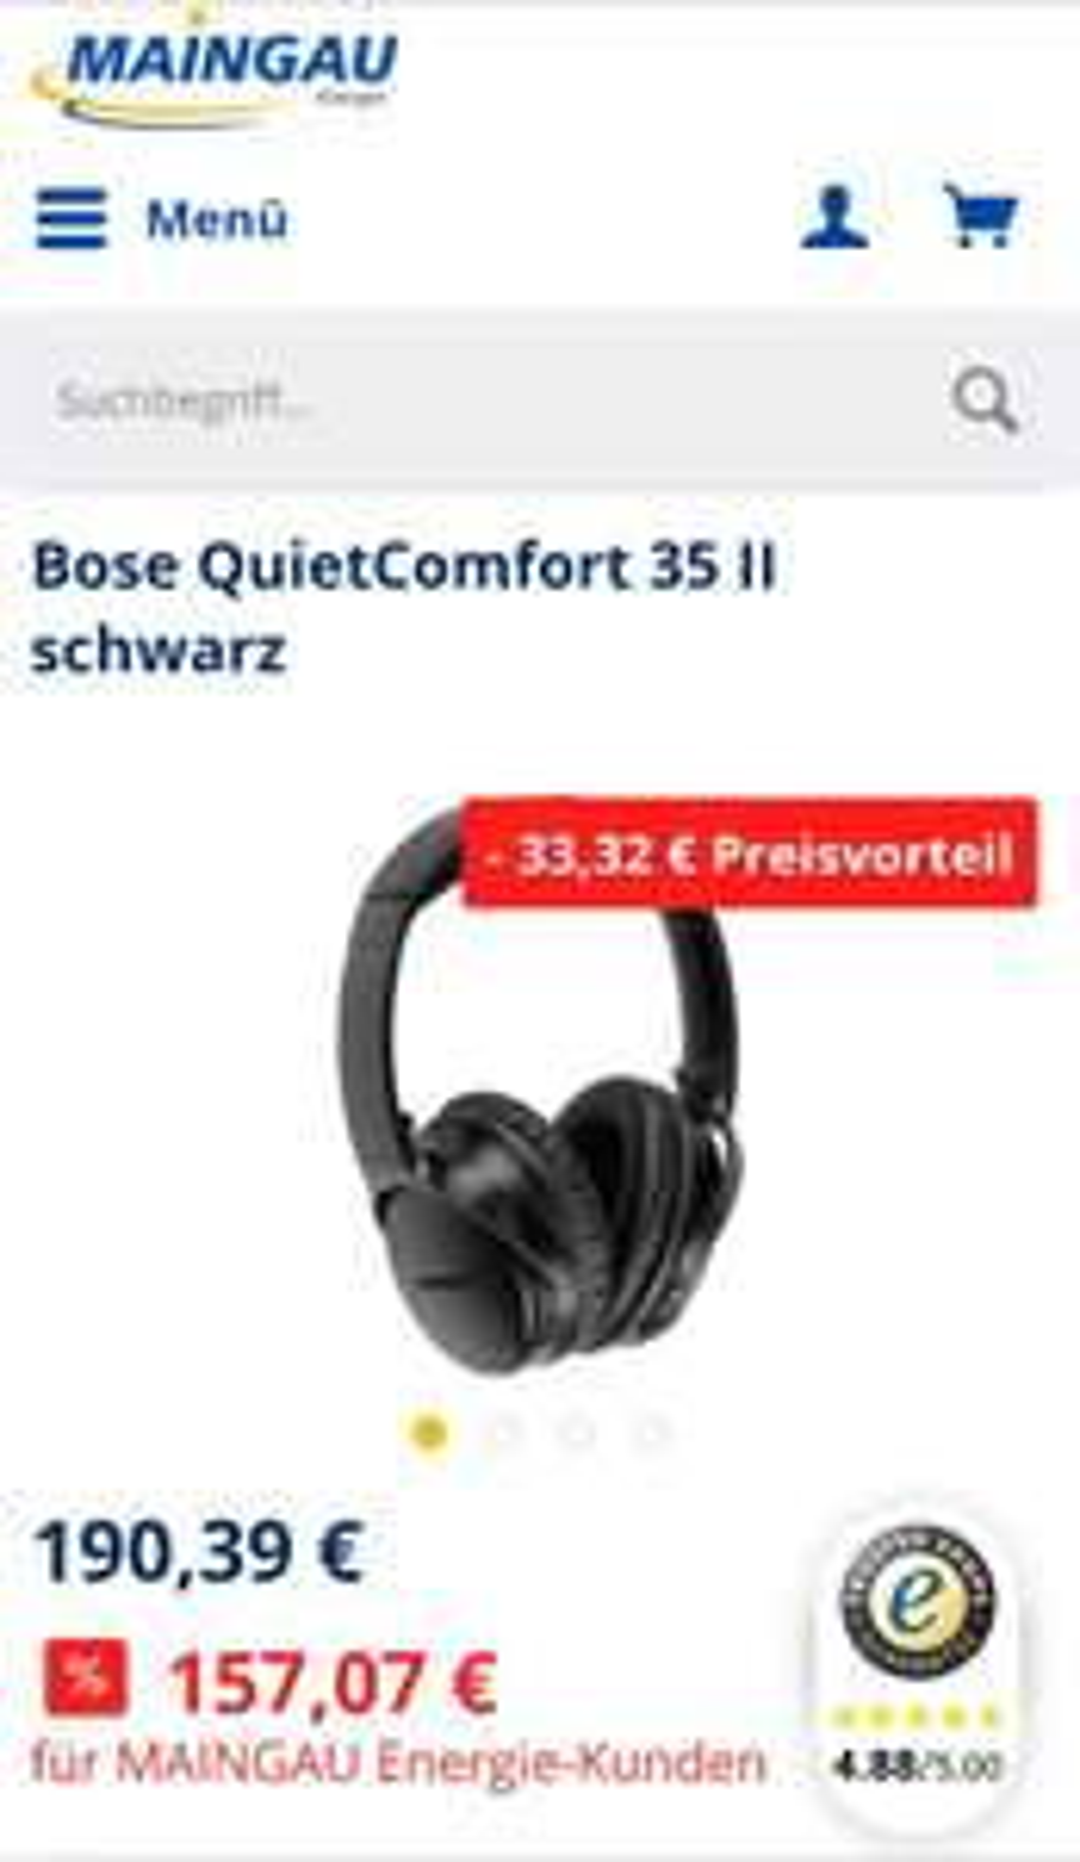 [Maingau Energie] Bose QuietComfort 35 II schwarz